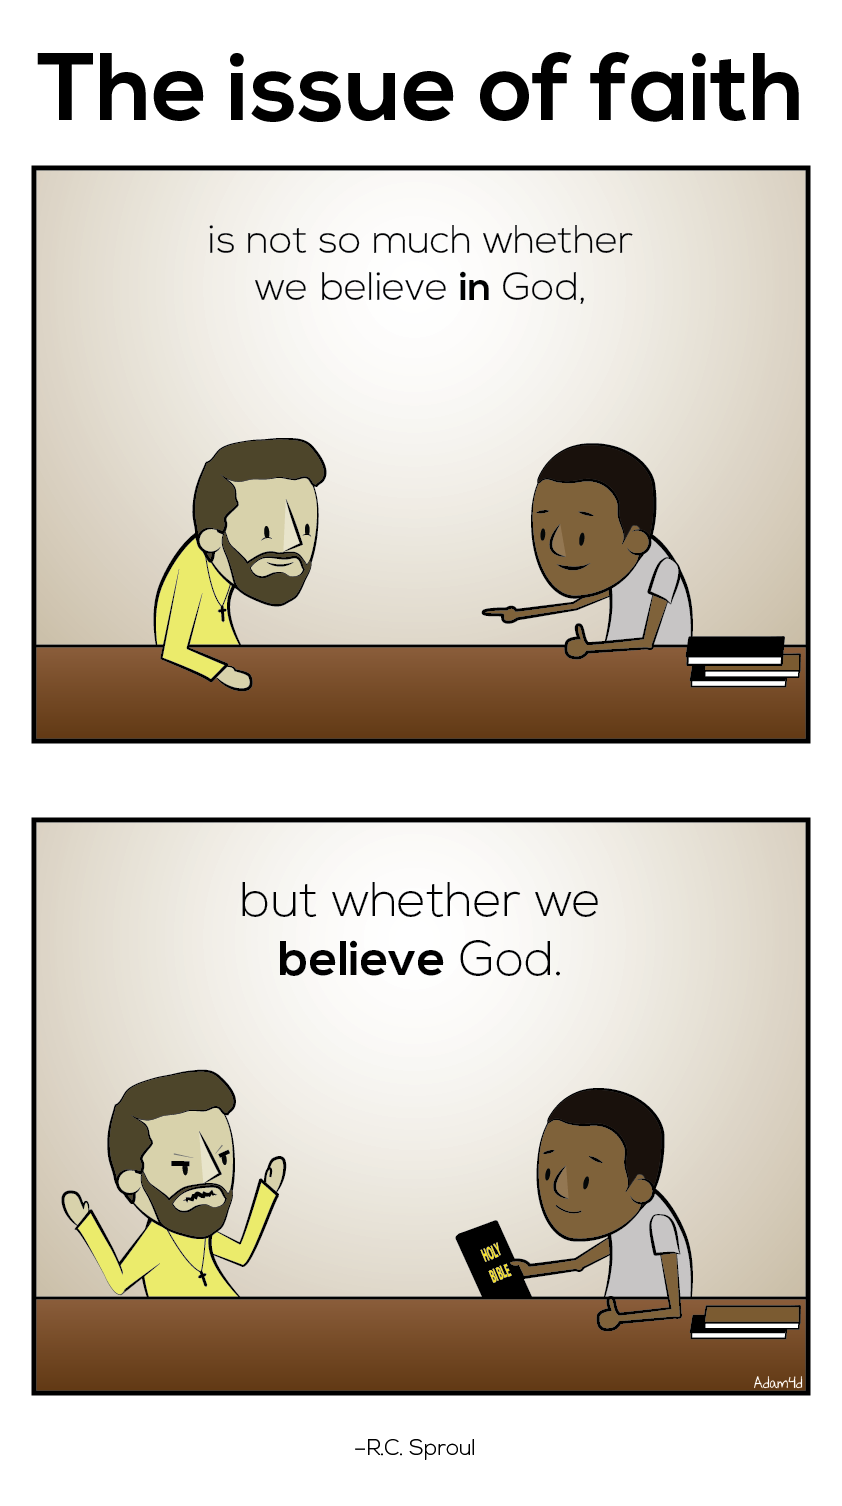 BRO I'M MORE SPIRITUAL THAN RELIGIOUS RLY